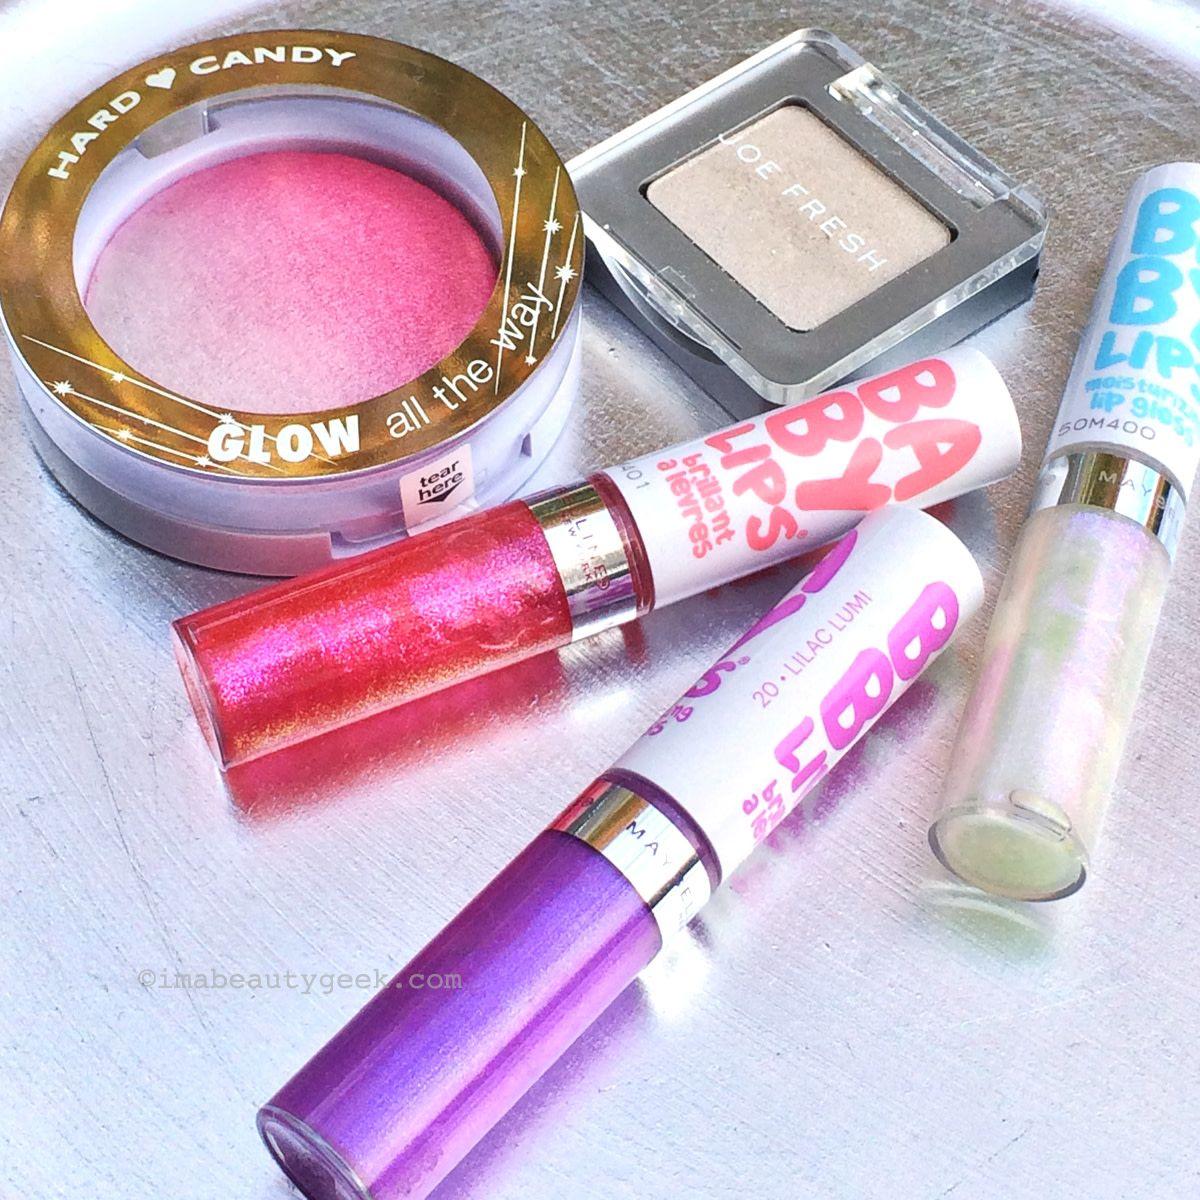 MAKEUP FOR A 10YEAROLD (With images) Makeup geek, Top